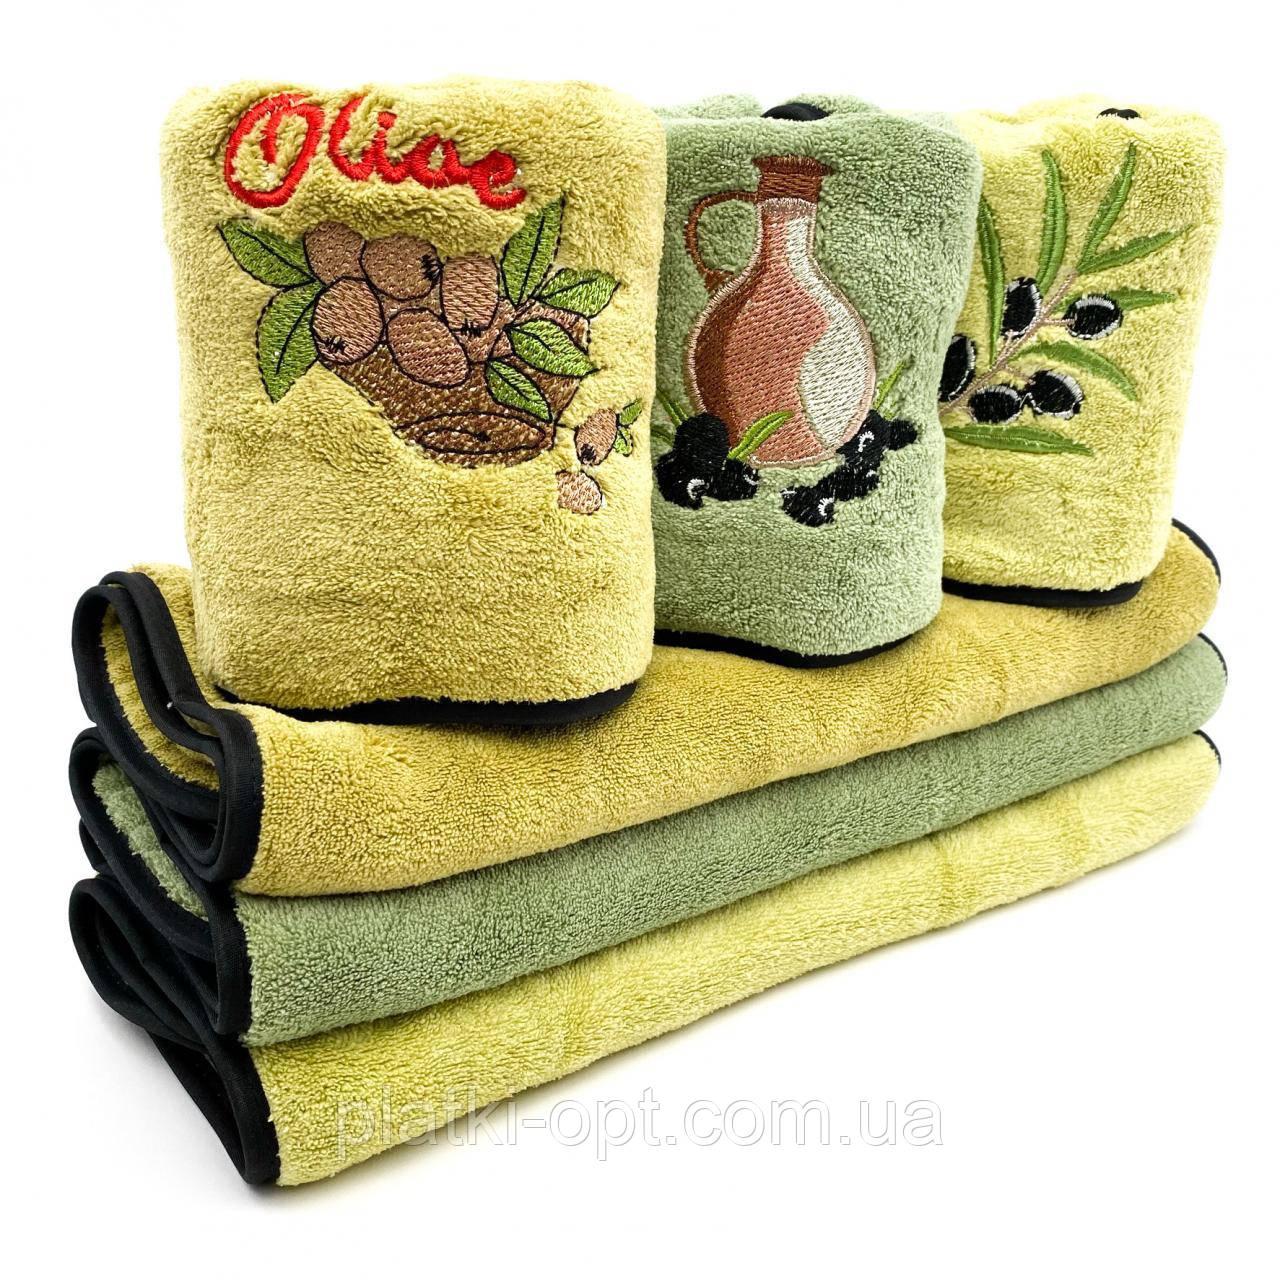 Набор кухонных полотенец Оливка 3 шт. (микрофибра), 50х25 см